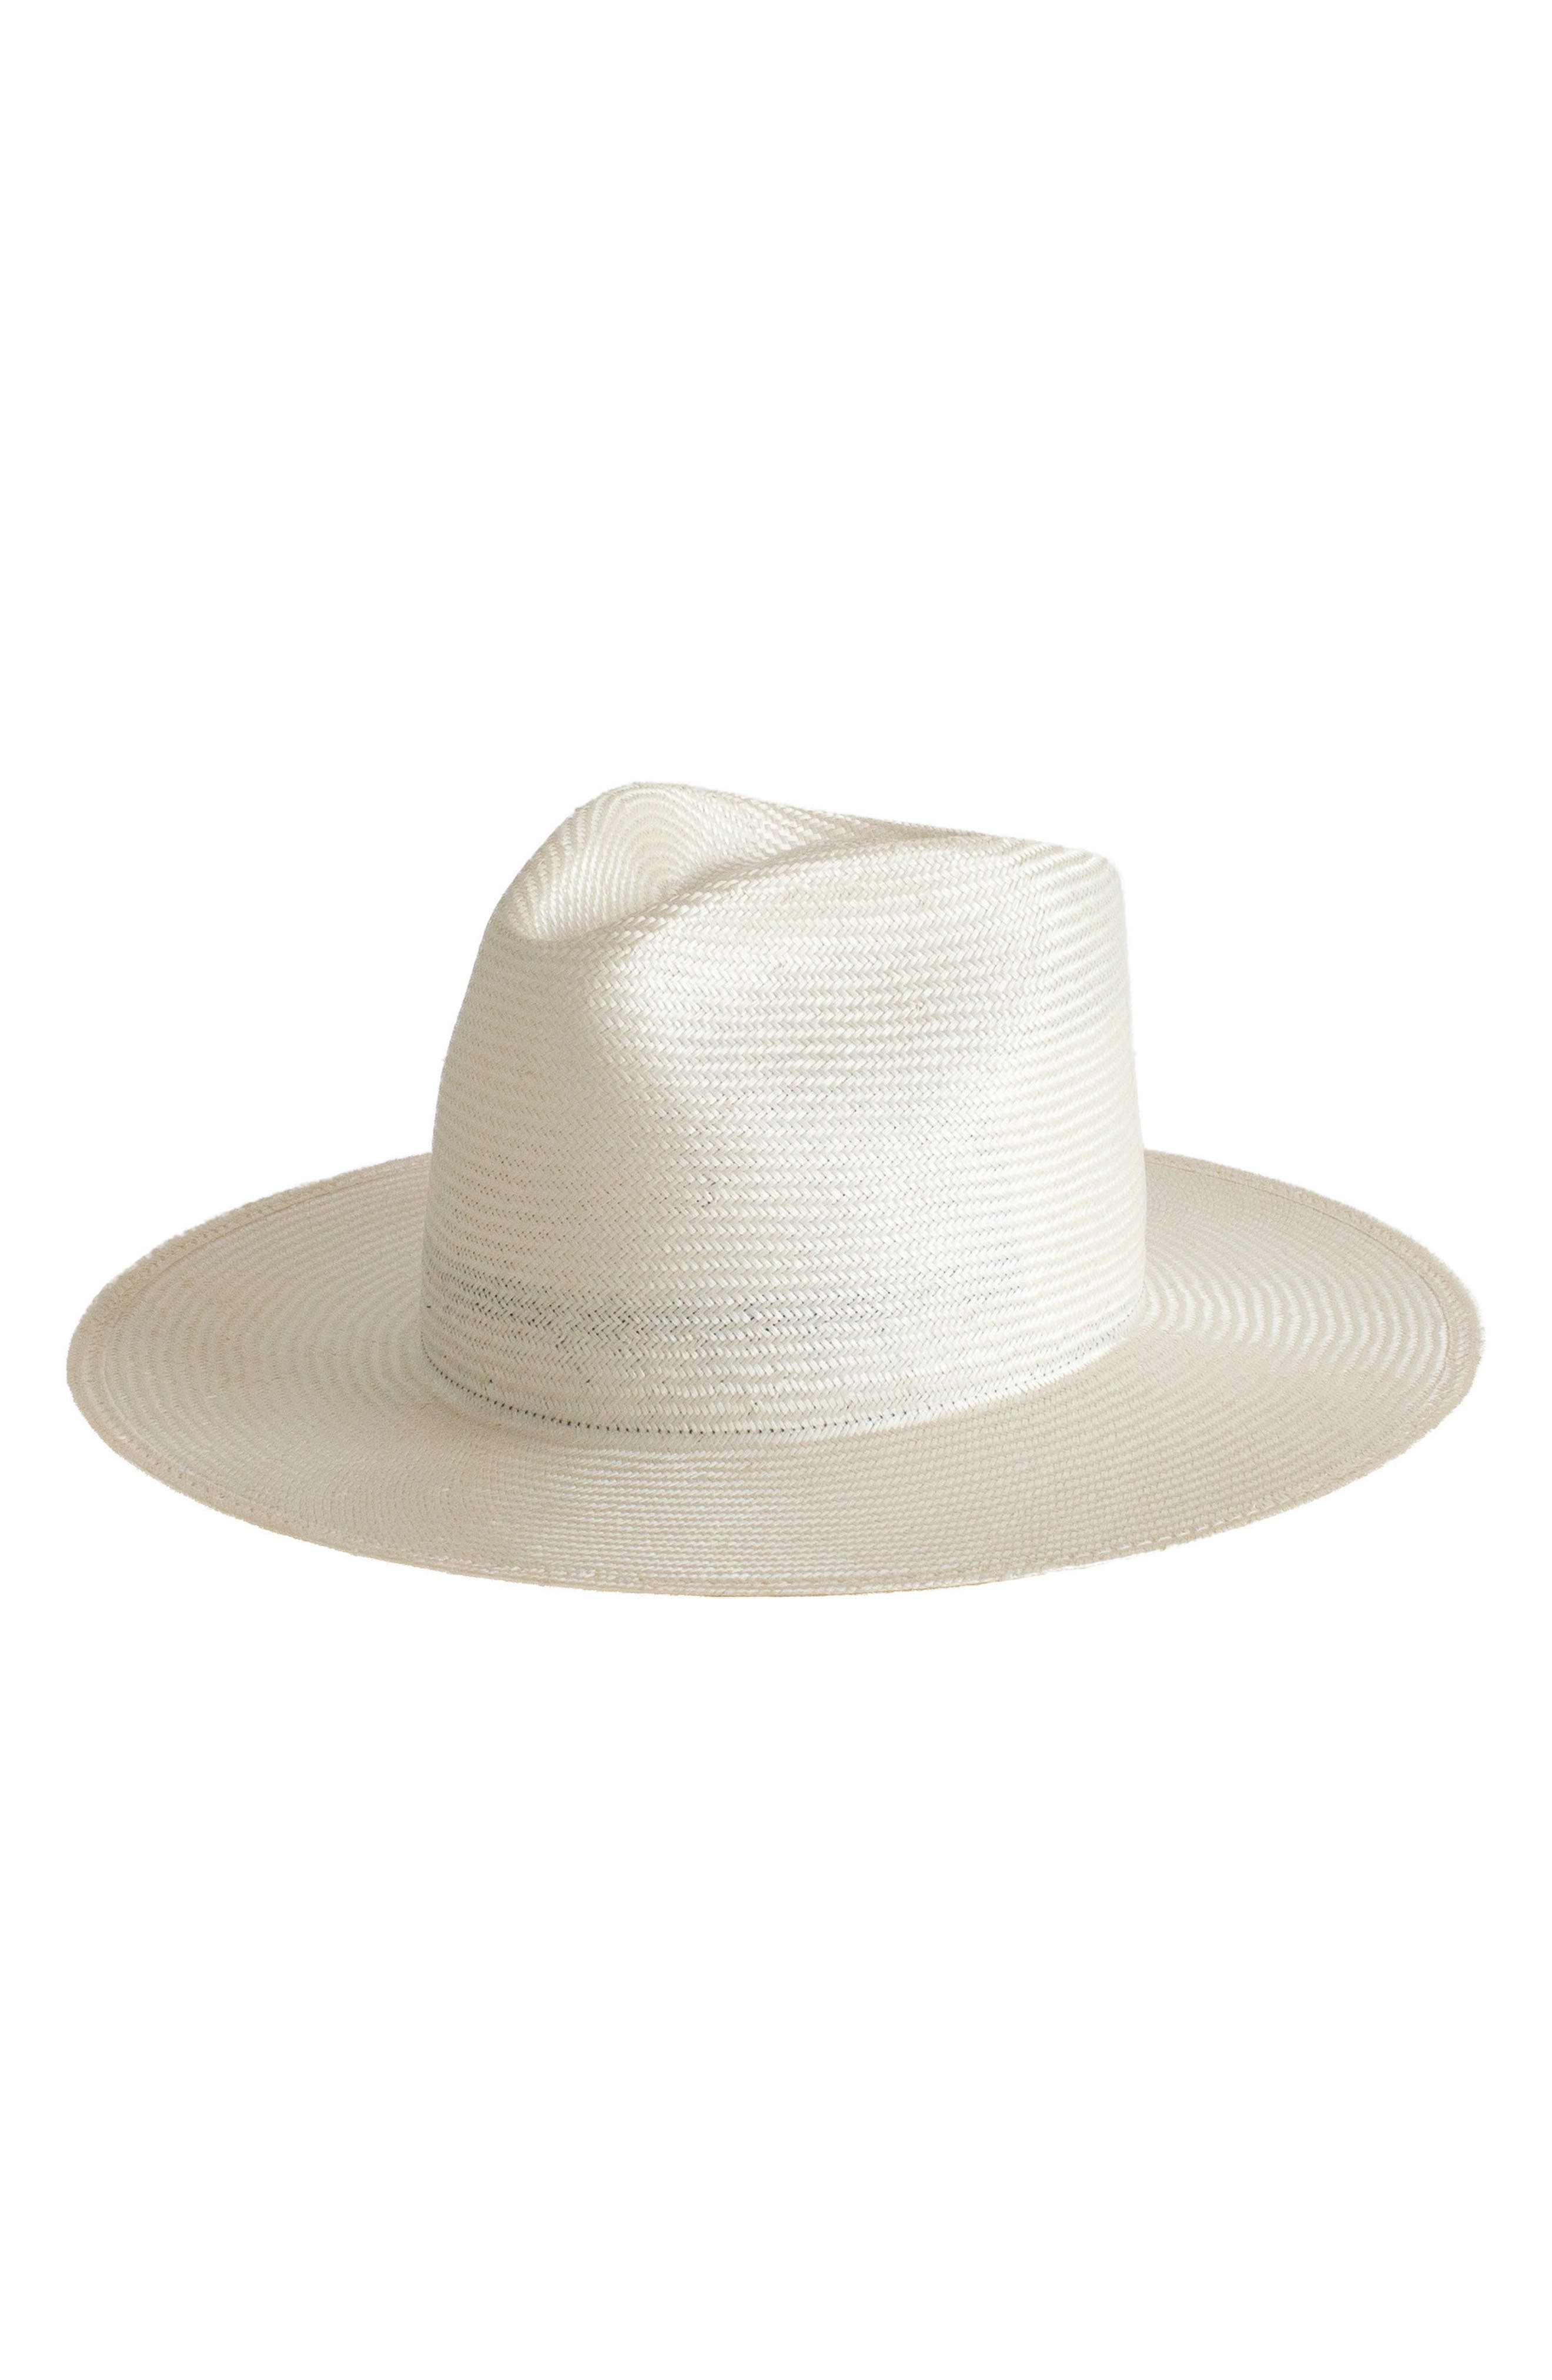 Main Image - Janessa Leone Alexander Straw Hat